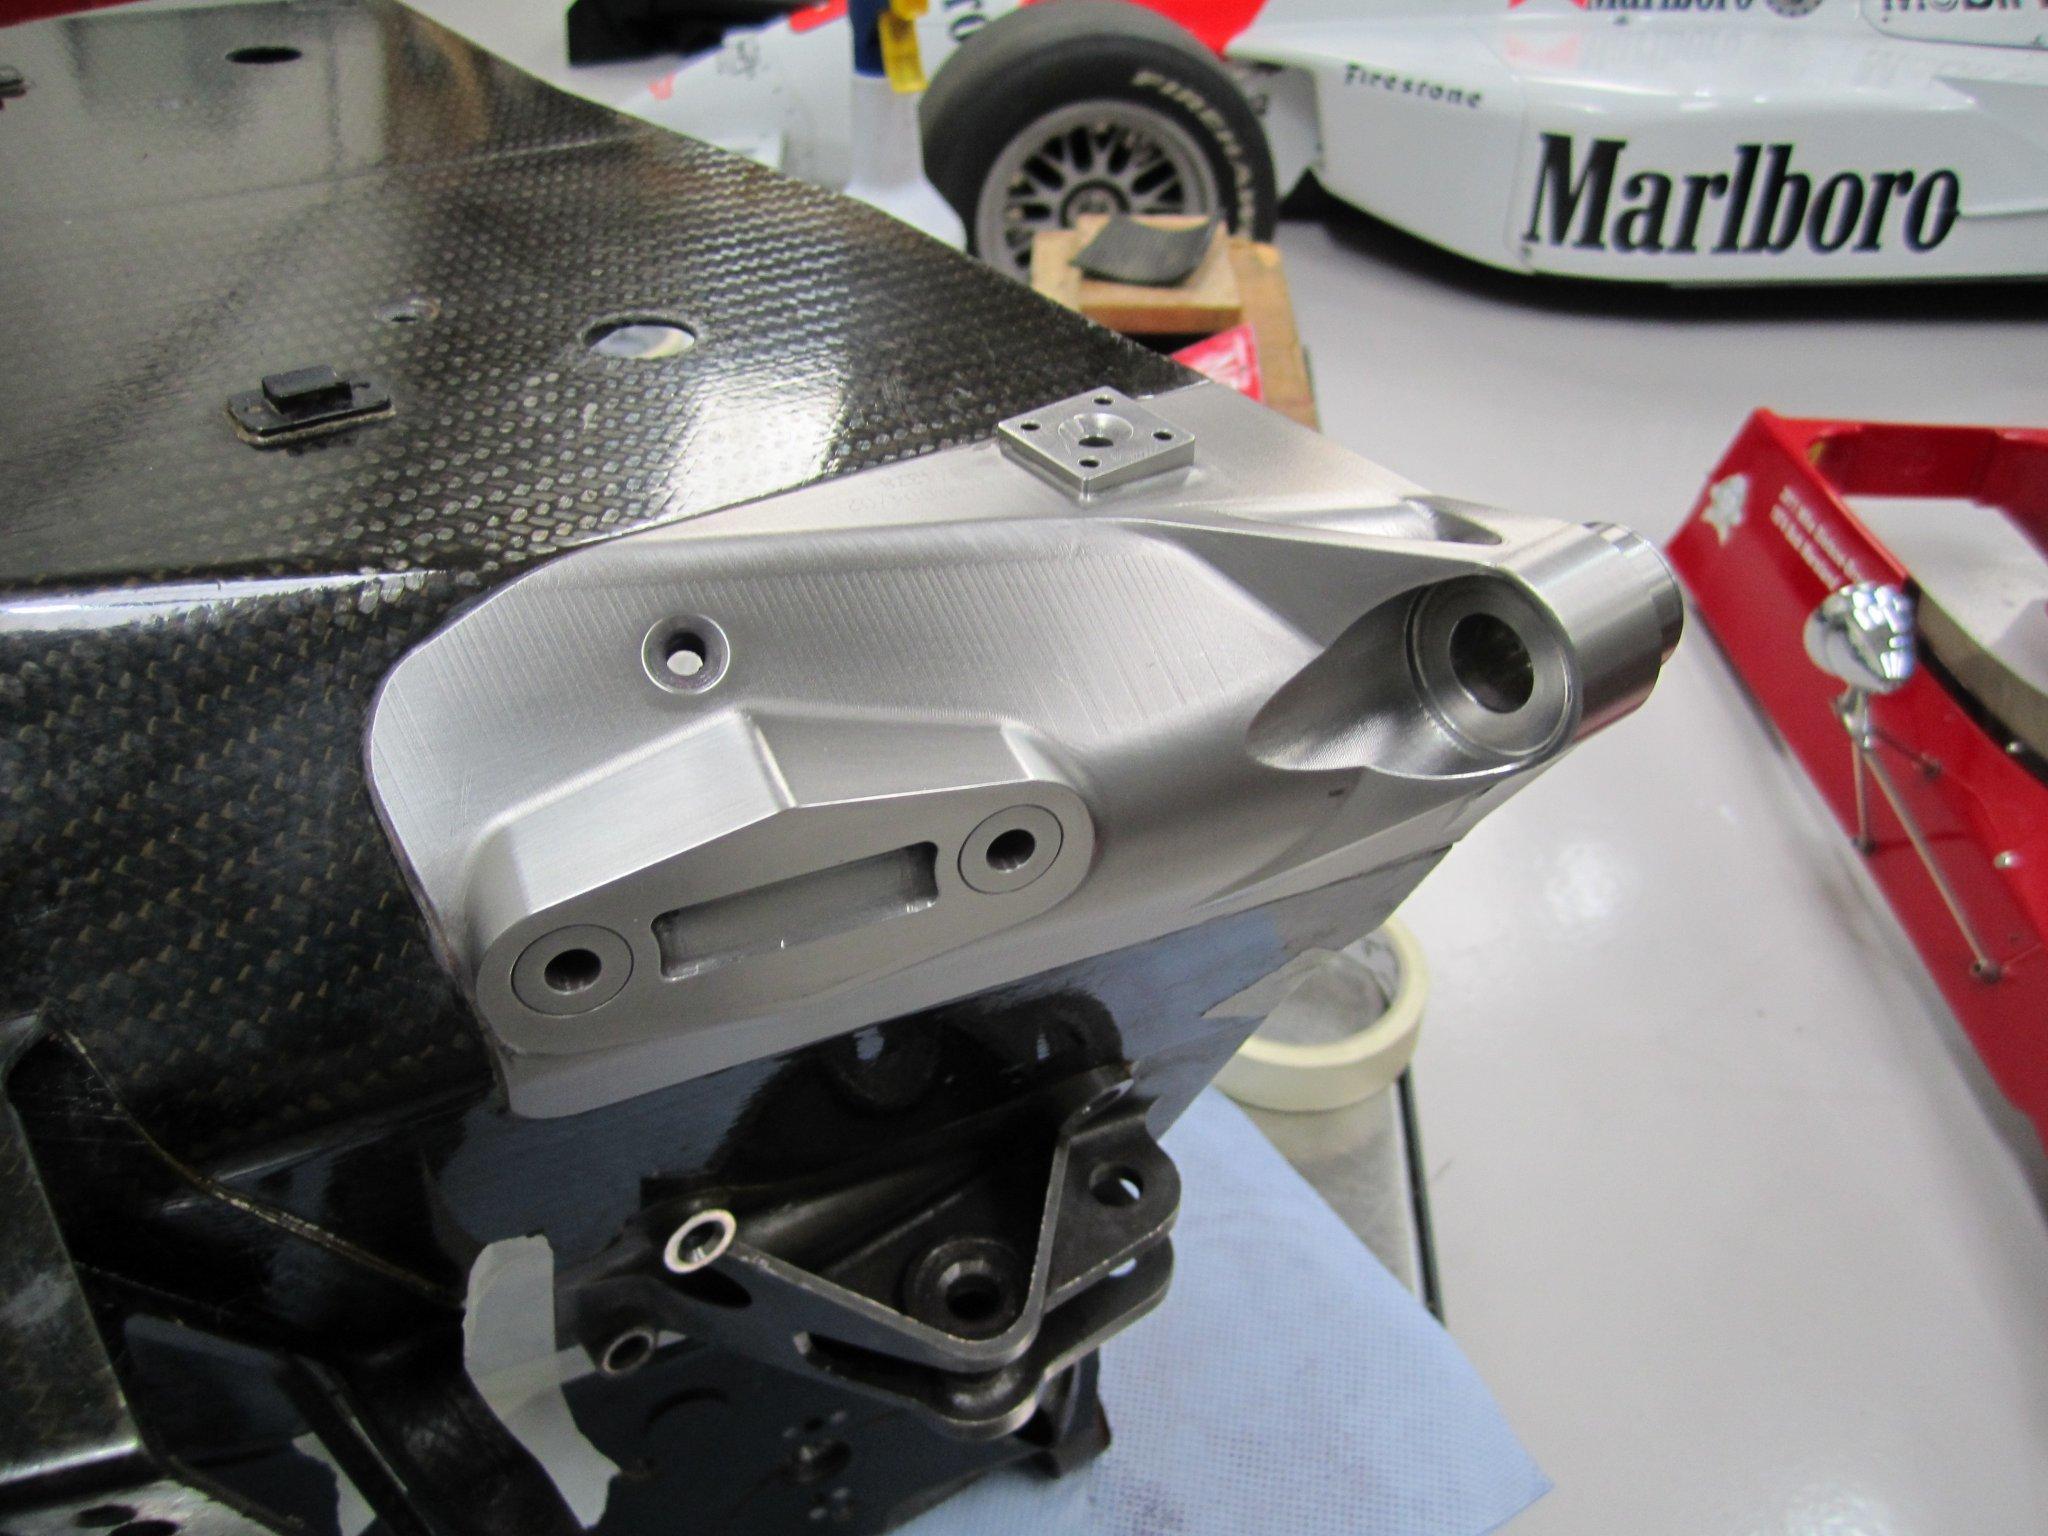 BAR-Honda Bonneville (1)